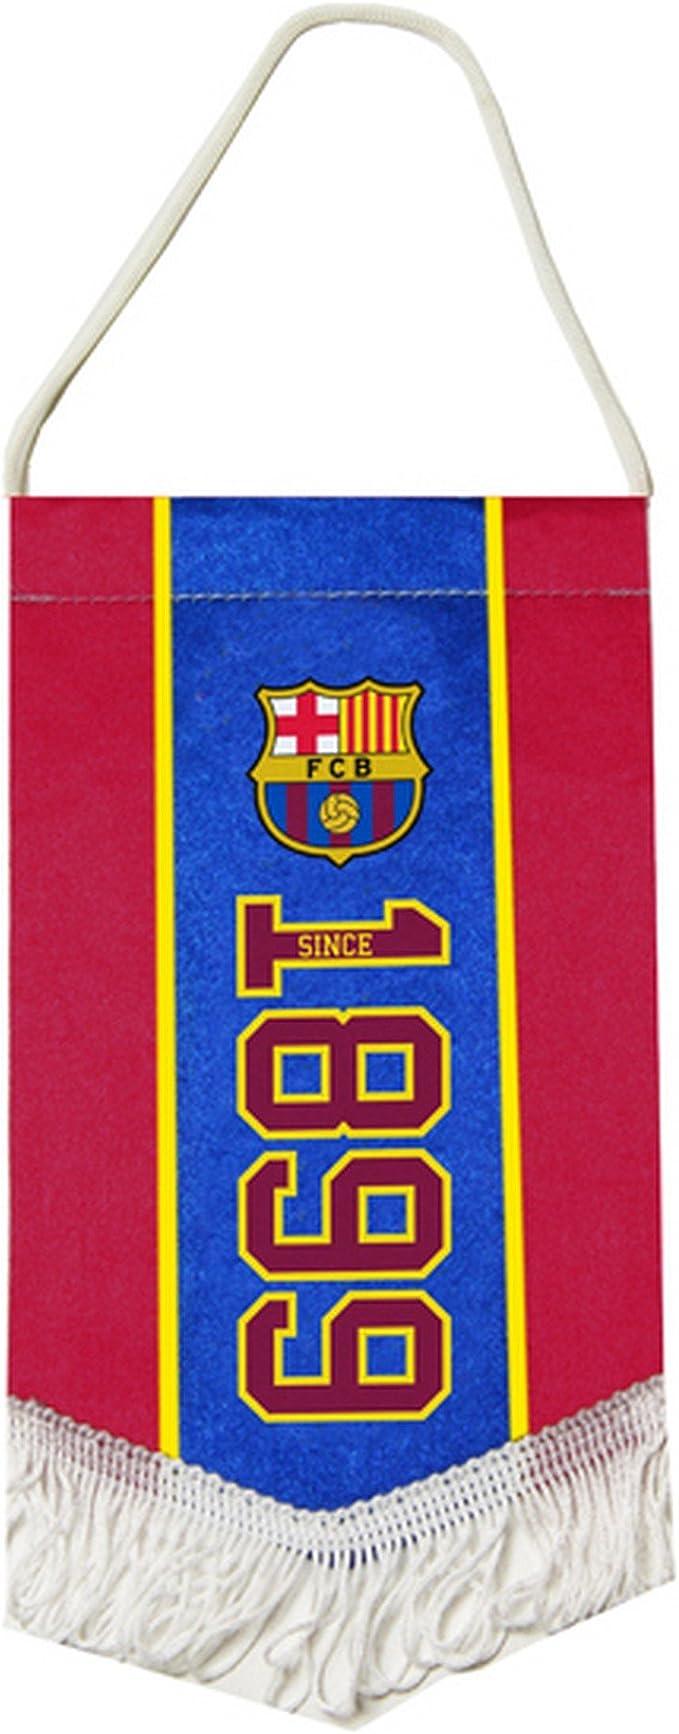 BARCELONA MINI PENNANT HANGING CAR ROOM 1889 OFFICIAL FOOTBALL SOCCER CLUB NEW